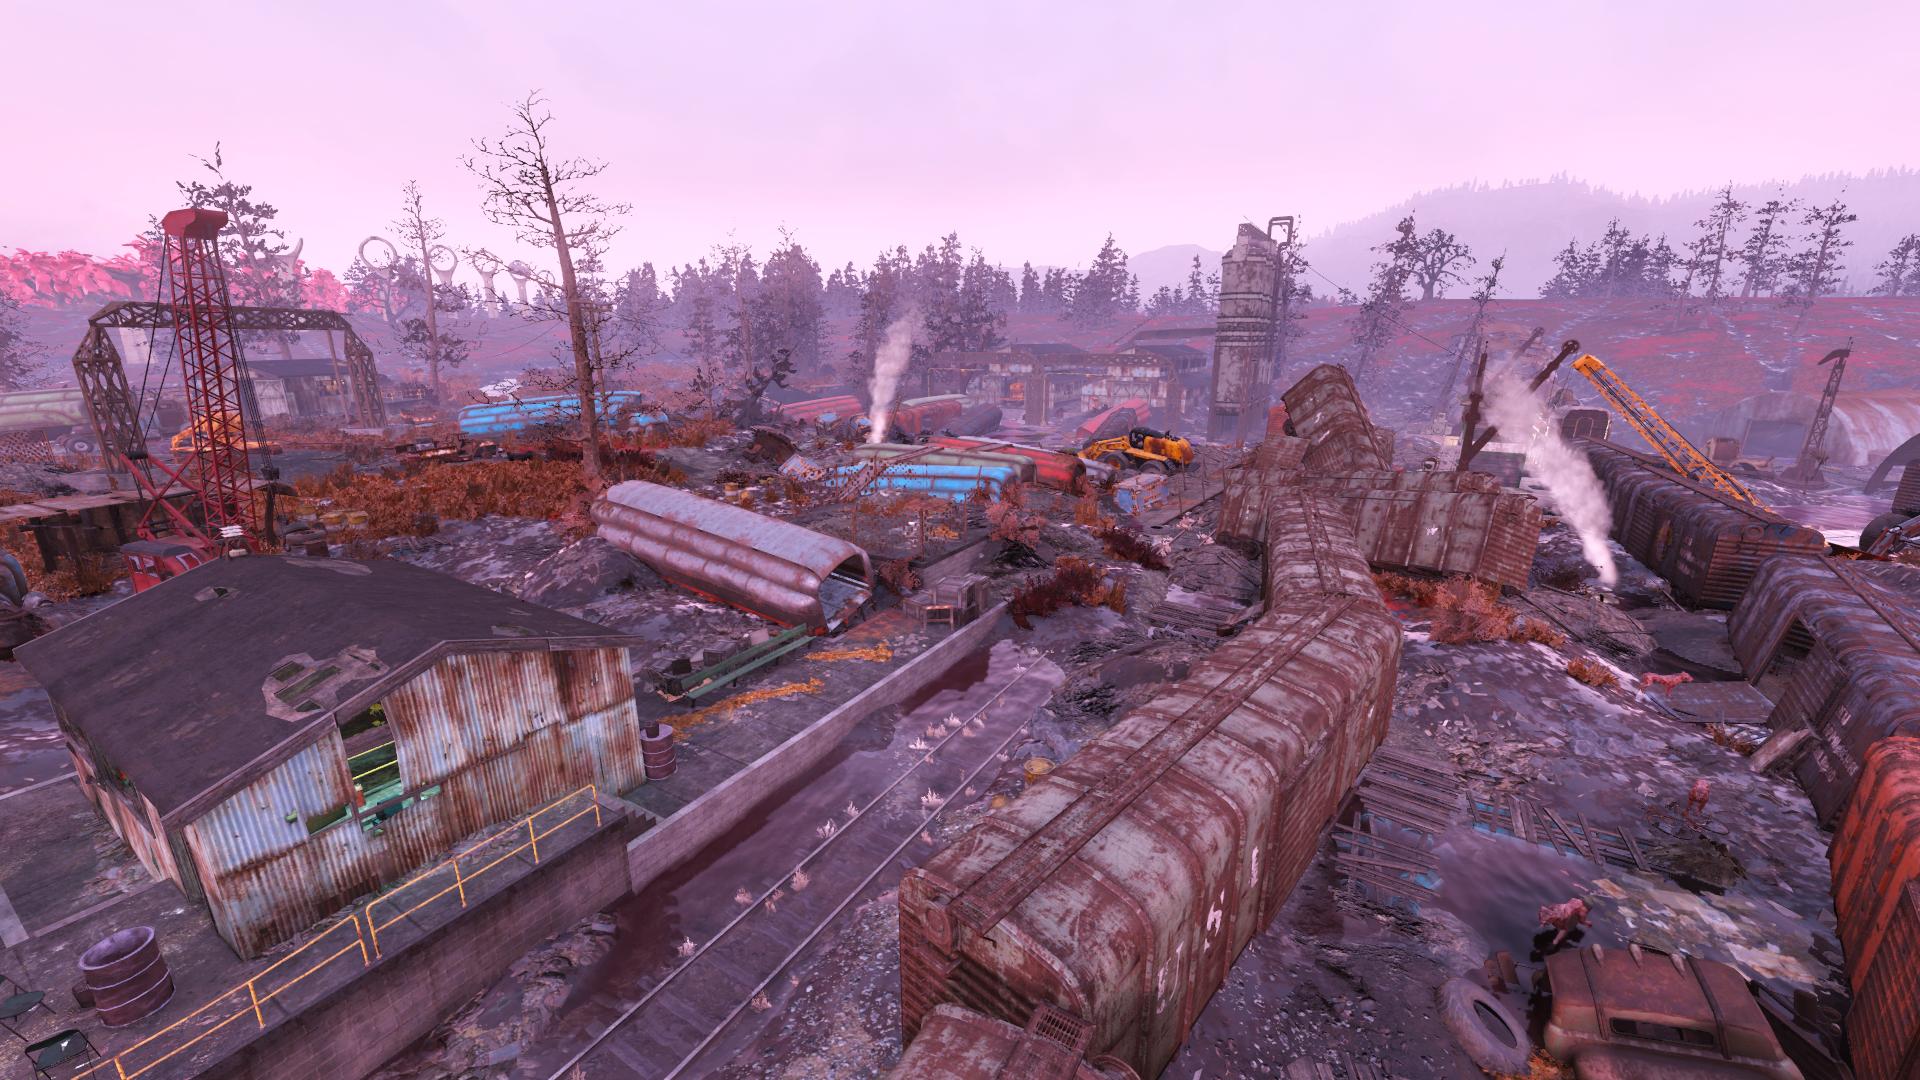 Flooded trainyard